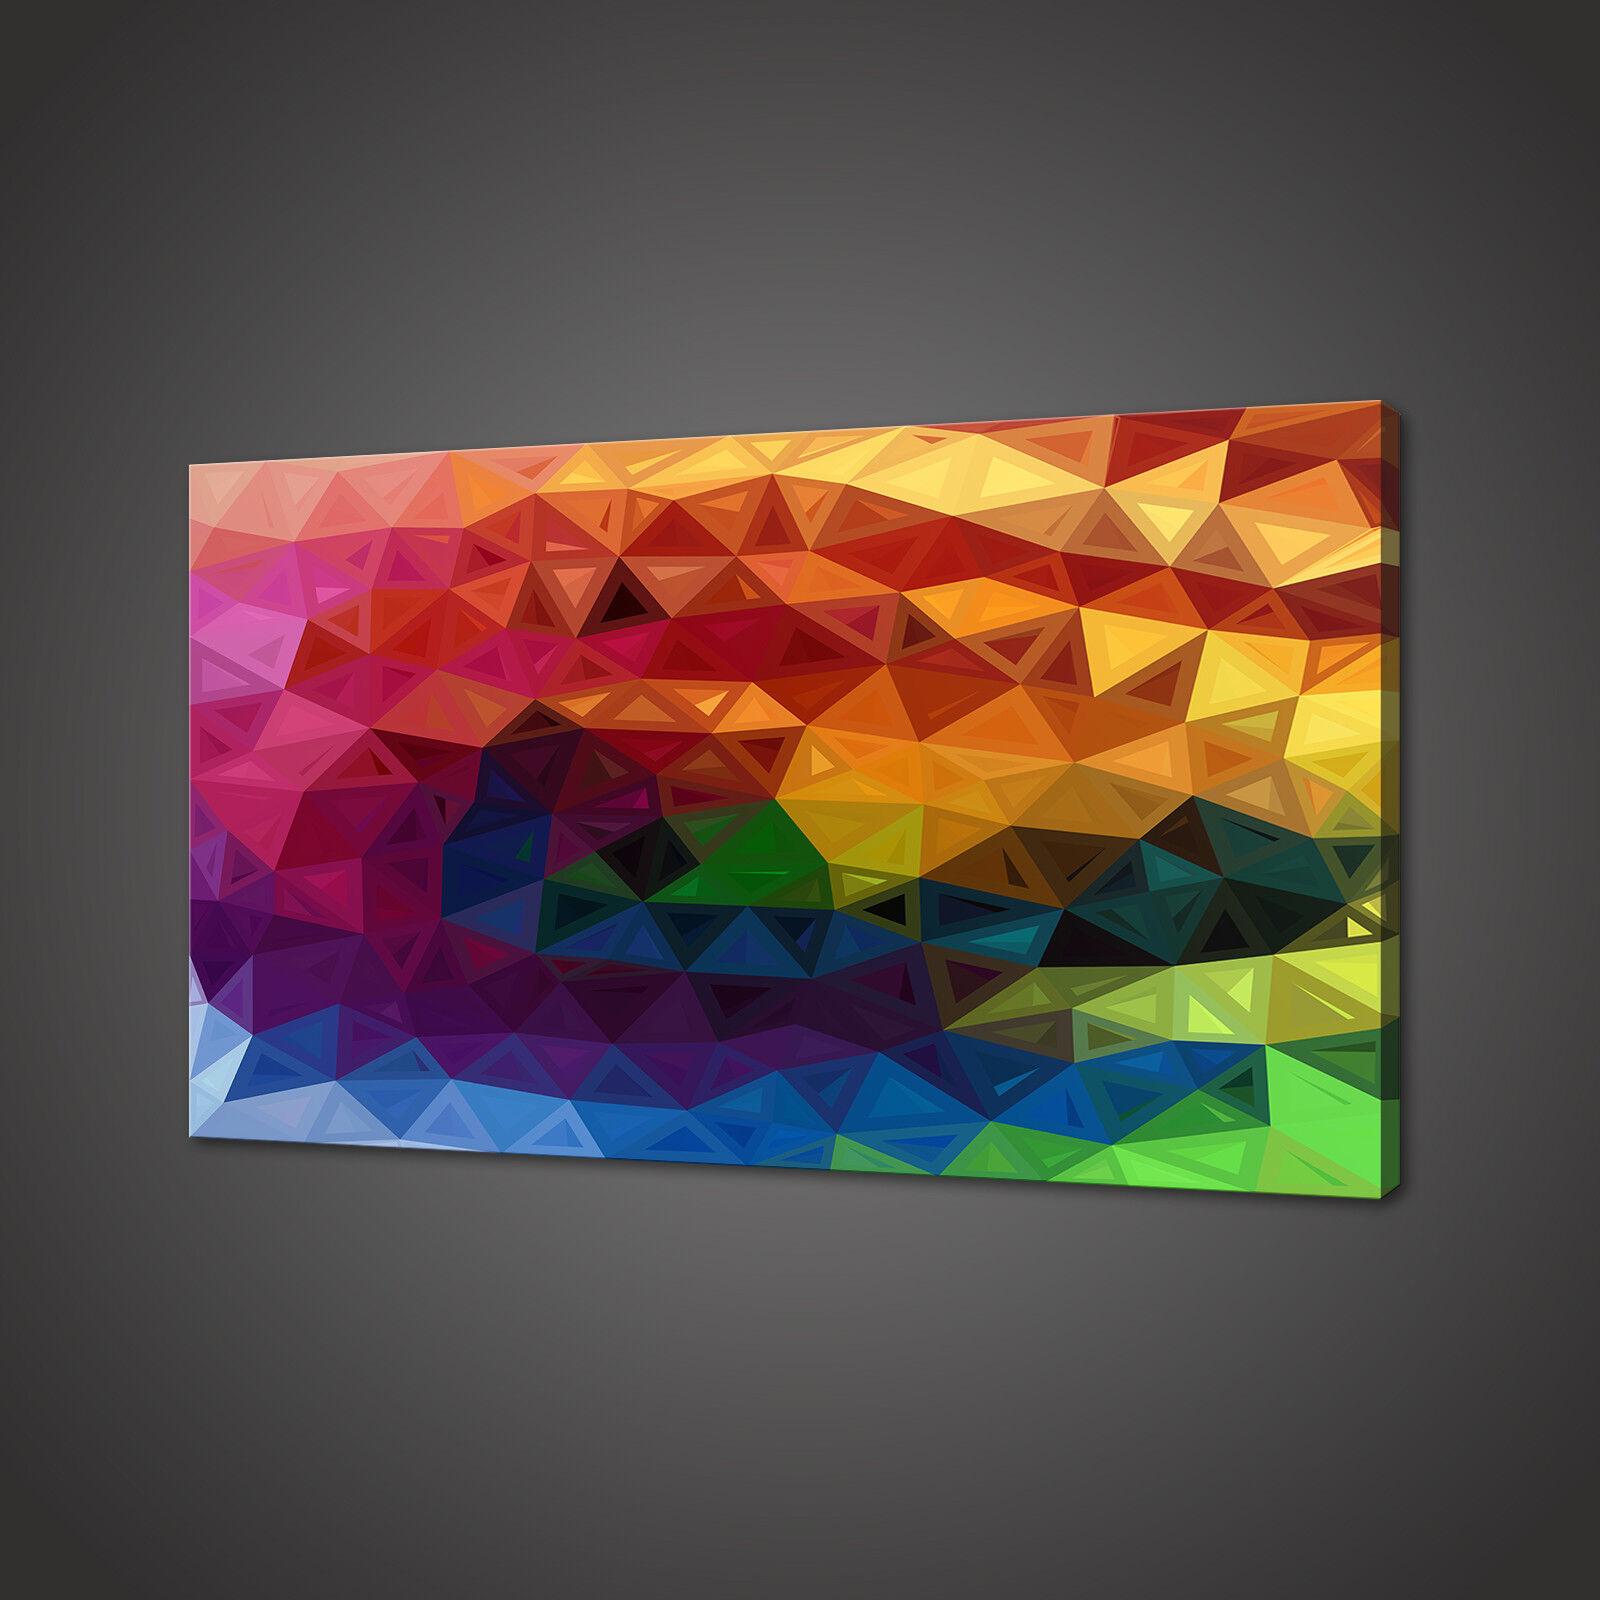 Design Astratto Rainbow Stampa Foto su tela Wall Art Design Moderno